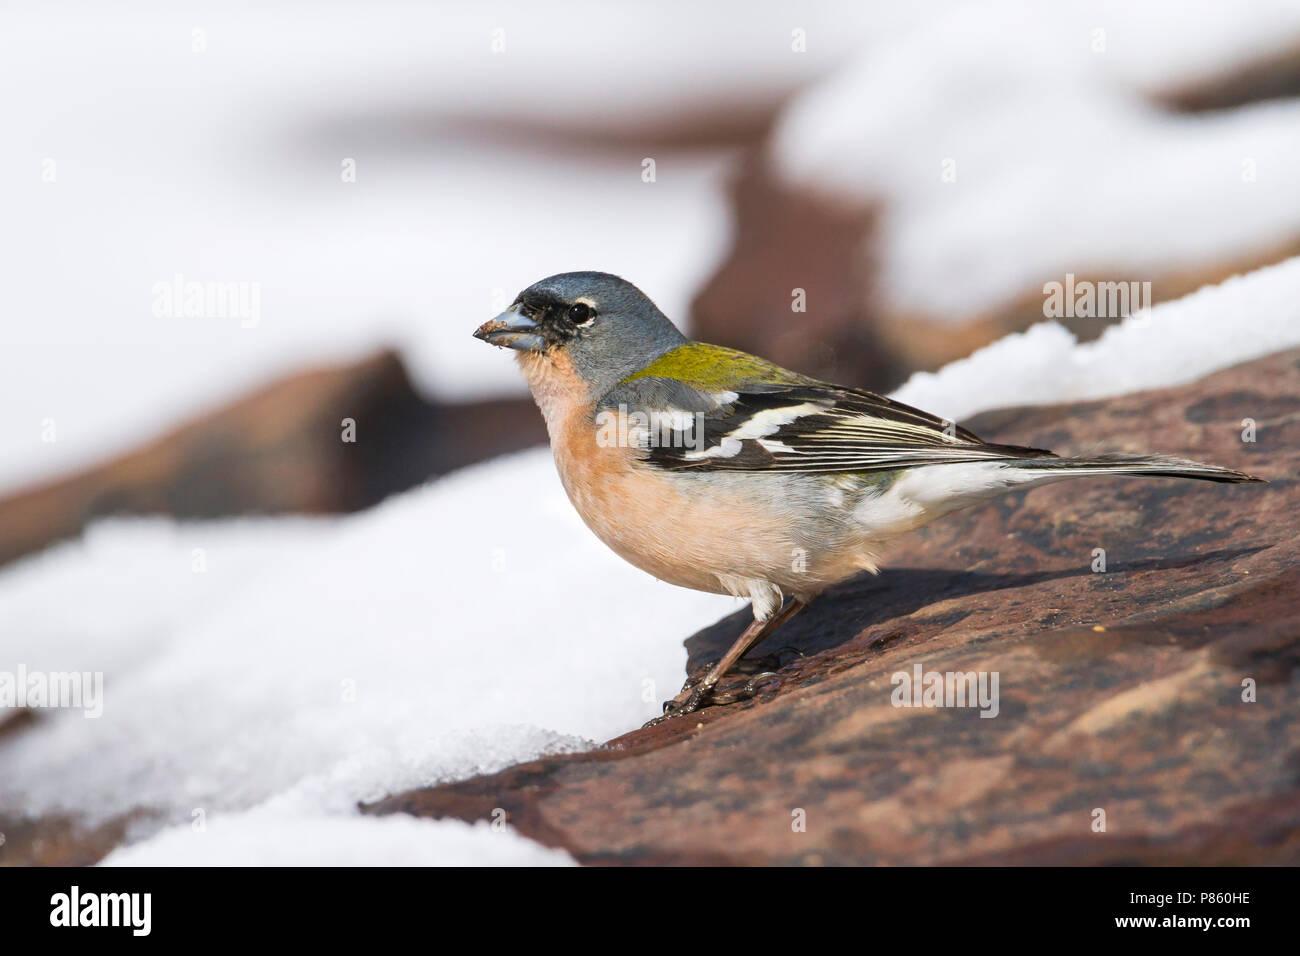 Atlas Chaffinch - Afrikanischer Buchfink - Fringilla coelebs ssp. africana, Morocco, male - Stock Image